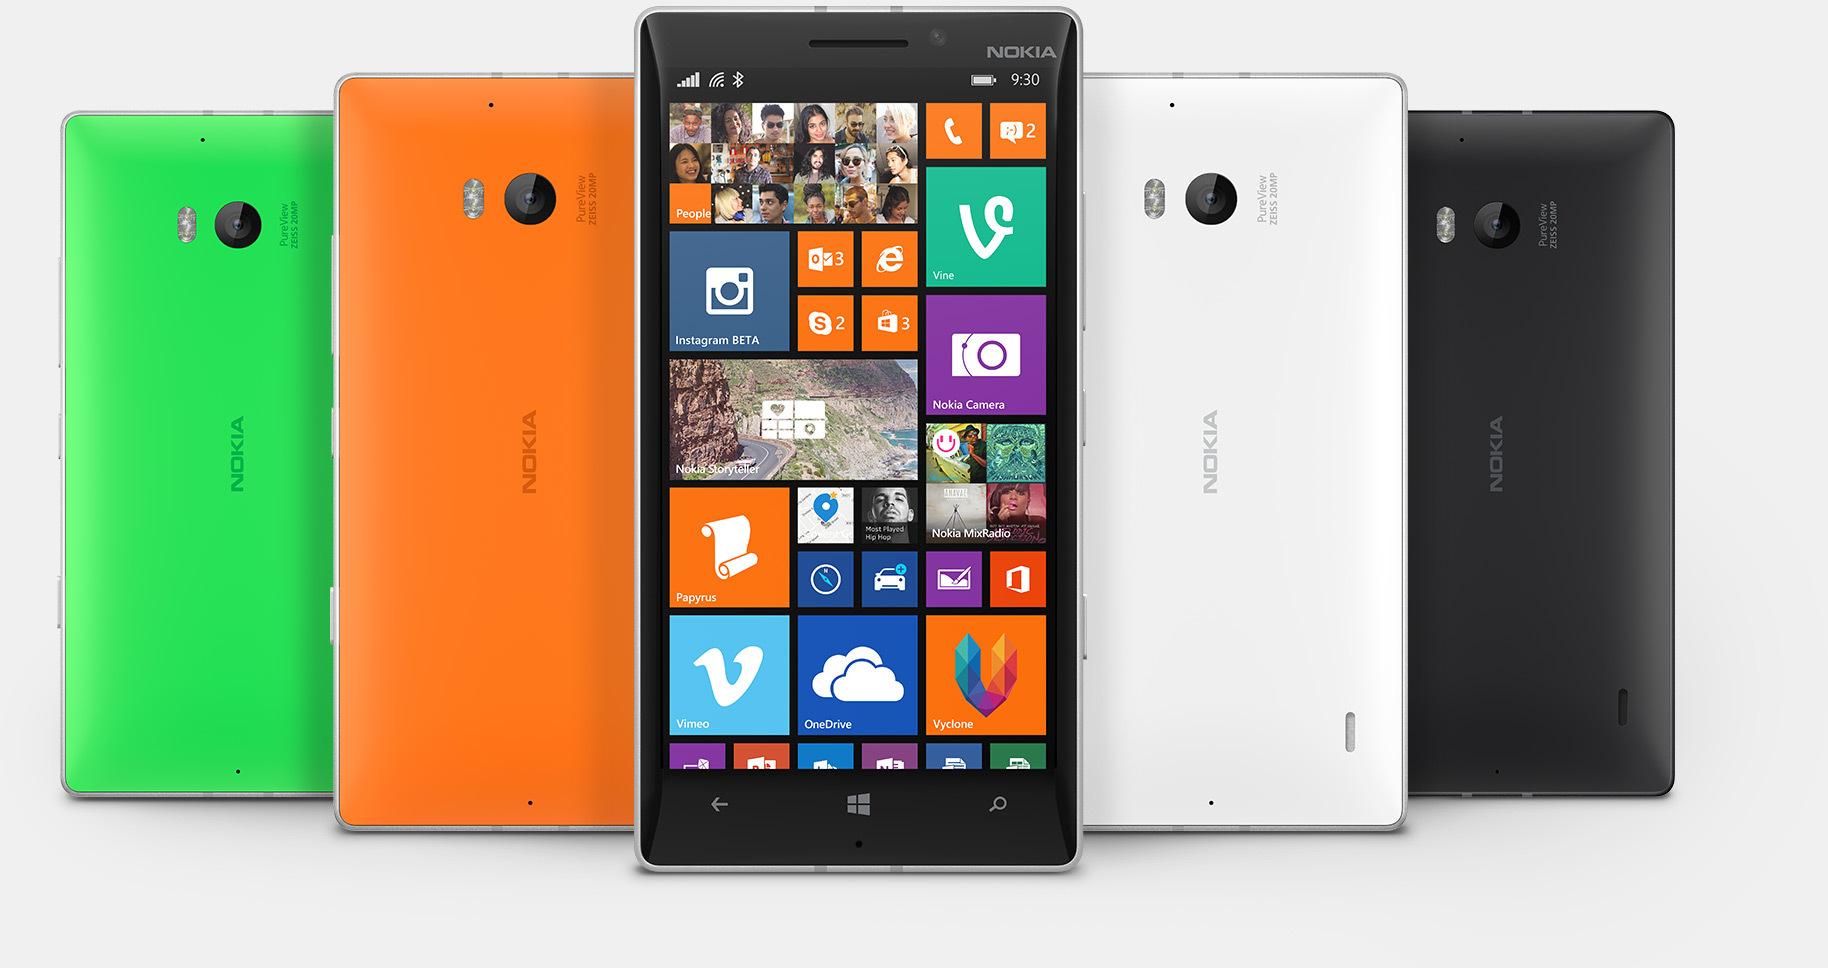 Test du Nokia Lumia 930, le presque sans faute - FraWin